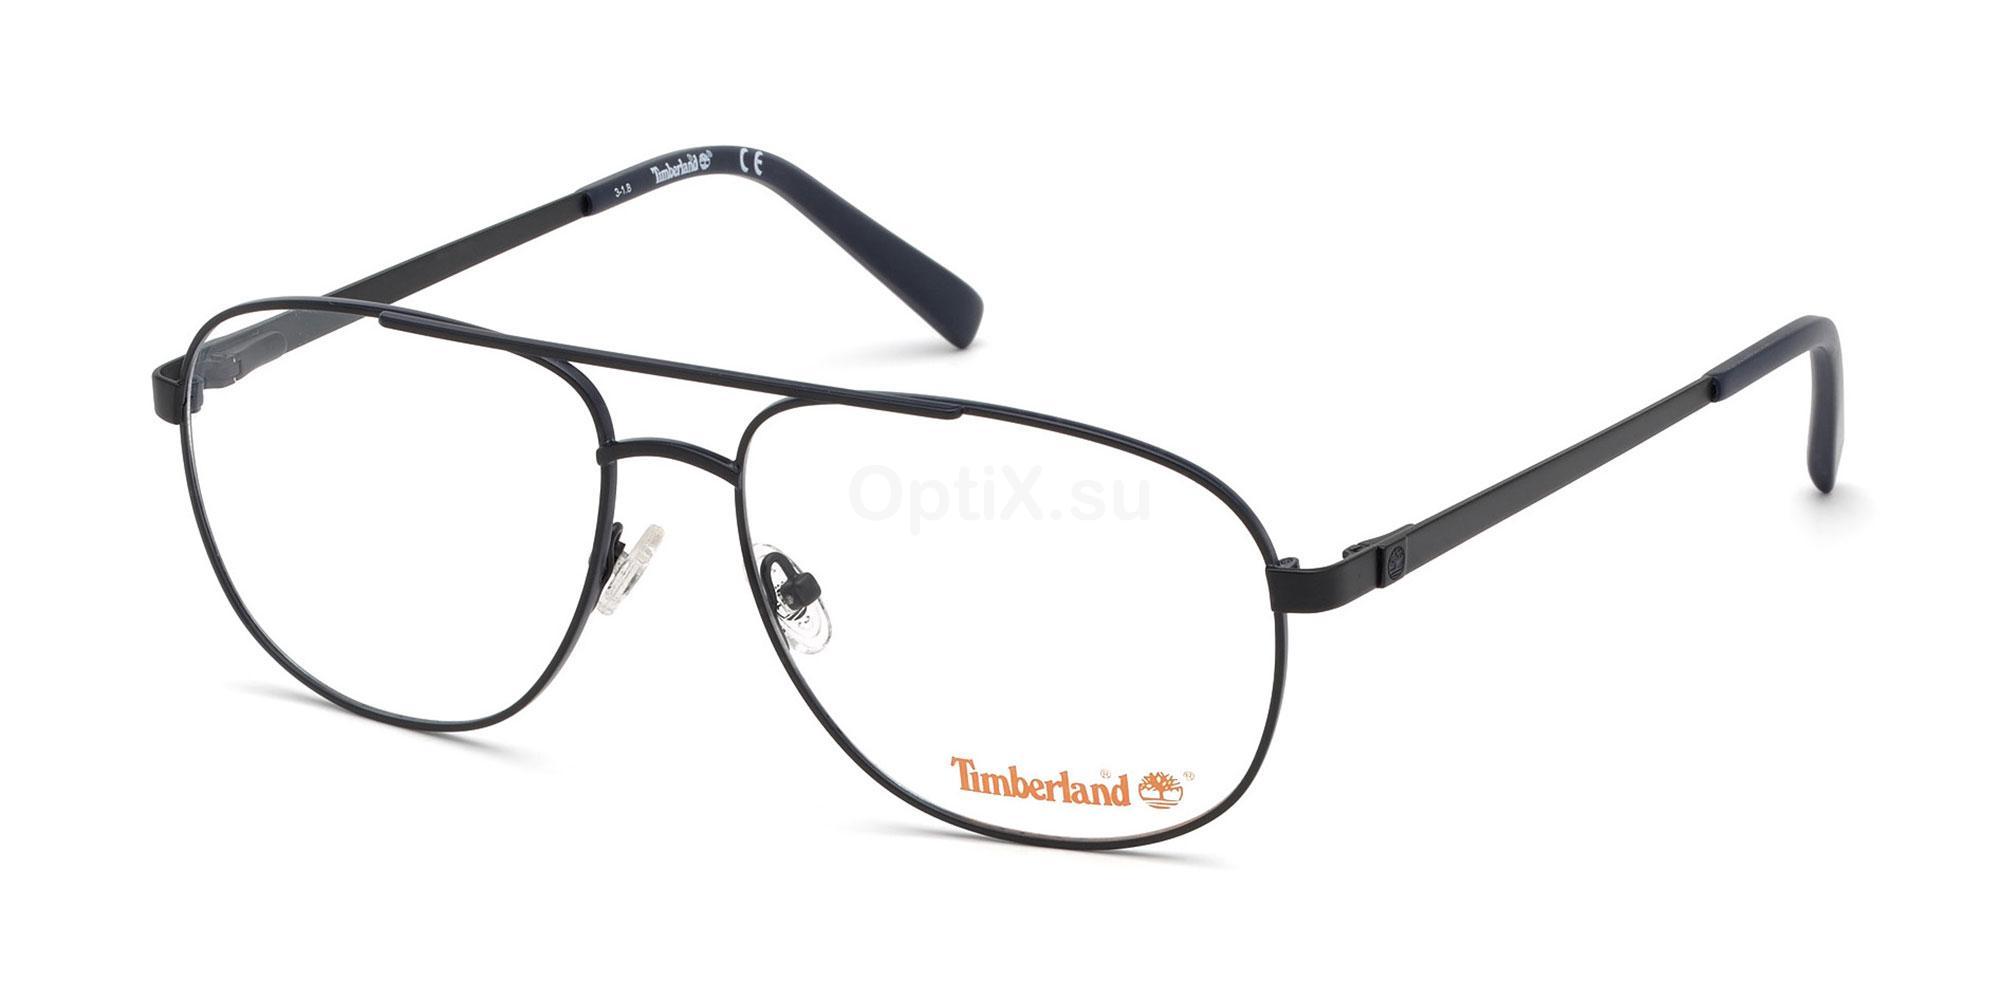 002 TB1614 Glasses, Timberland